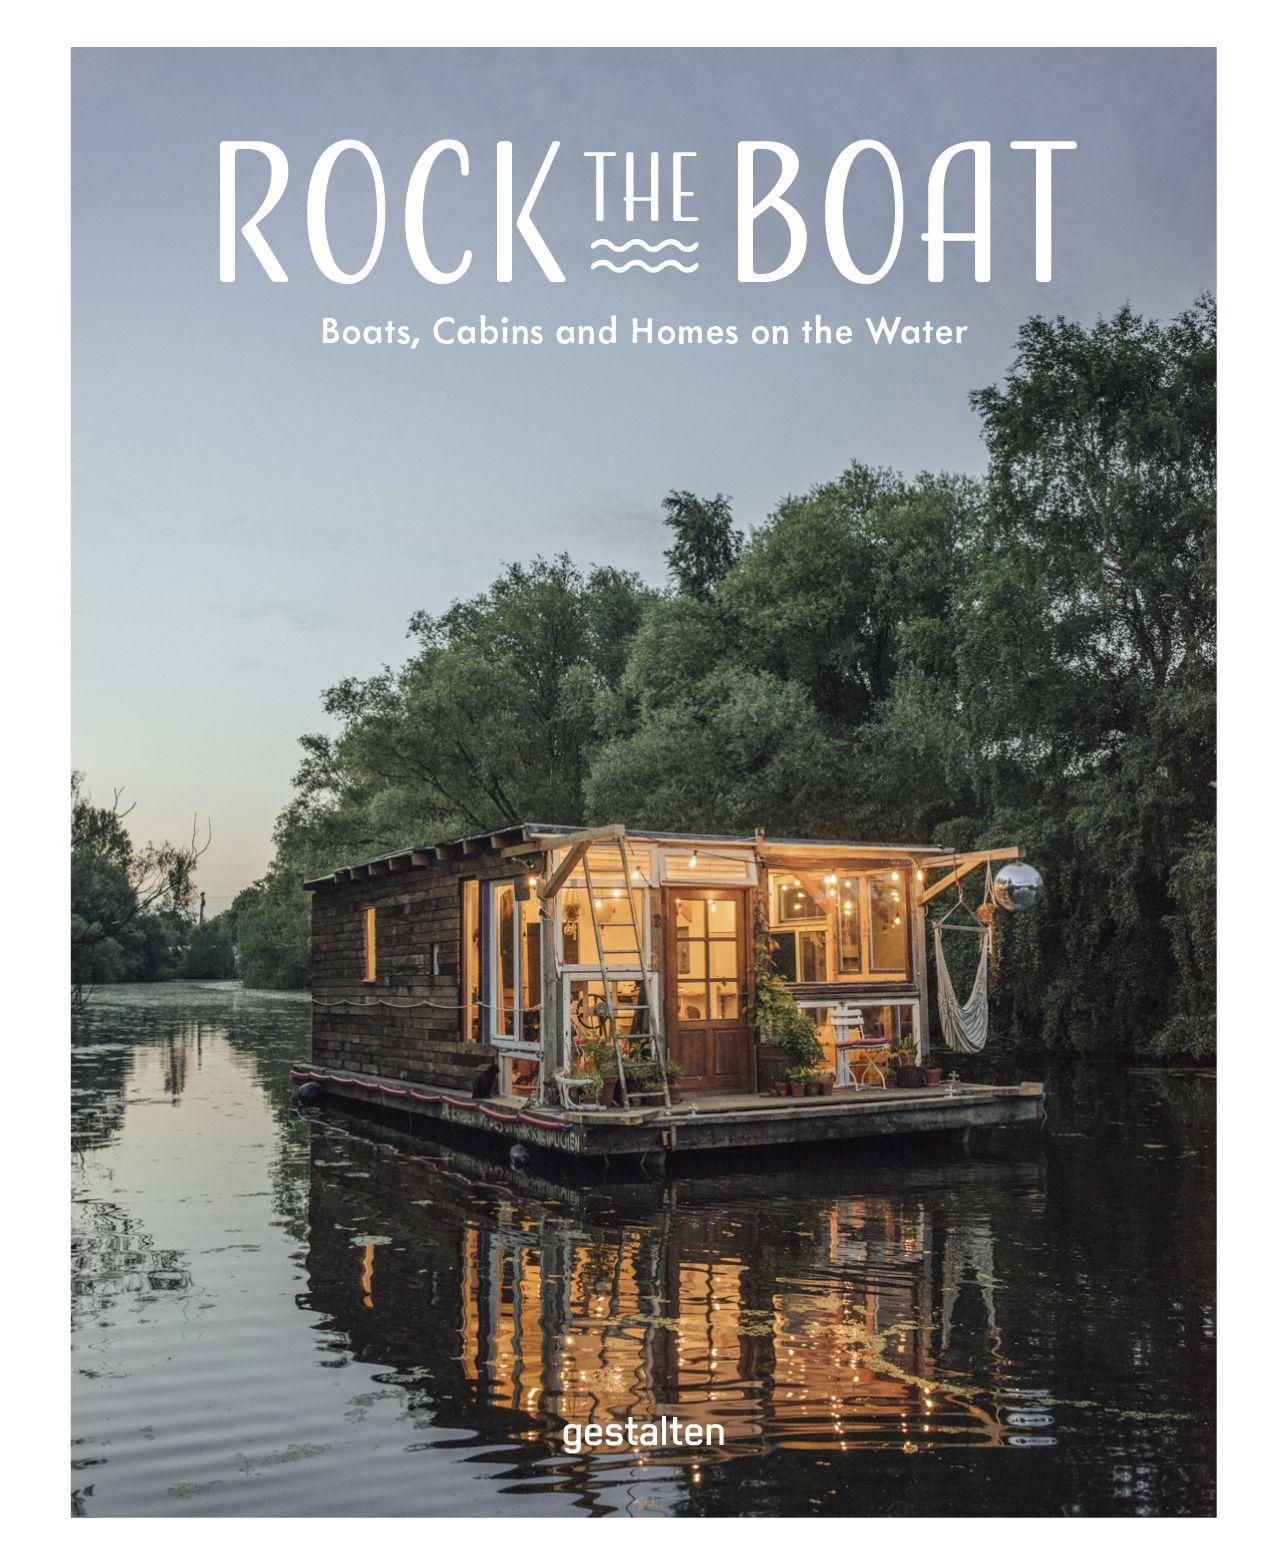 COVER Buch Rock the Boat gestalten 2017